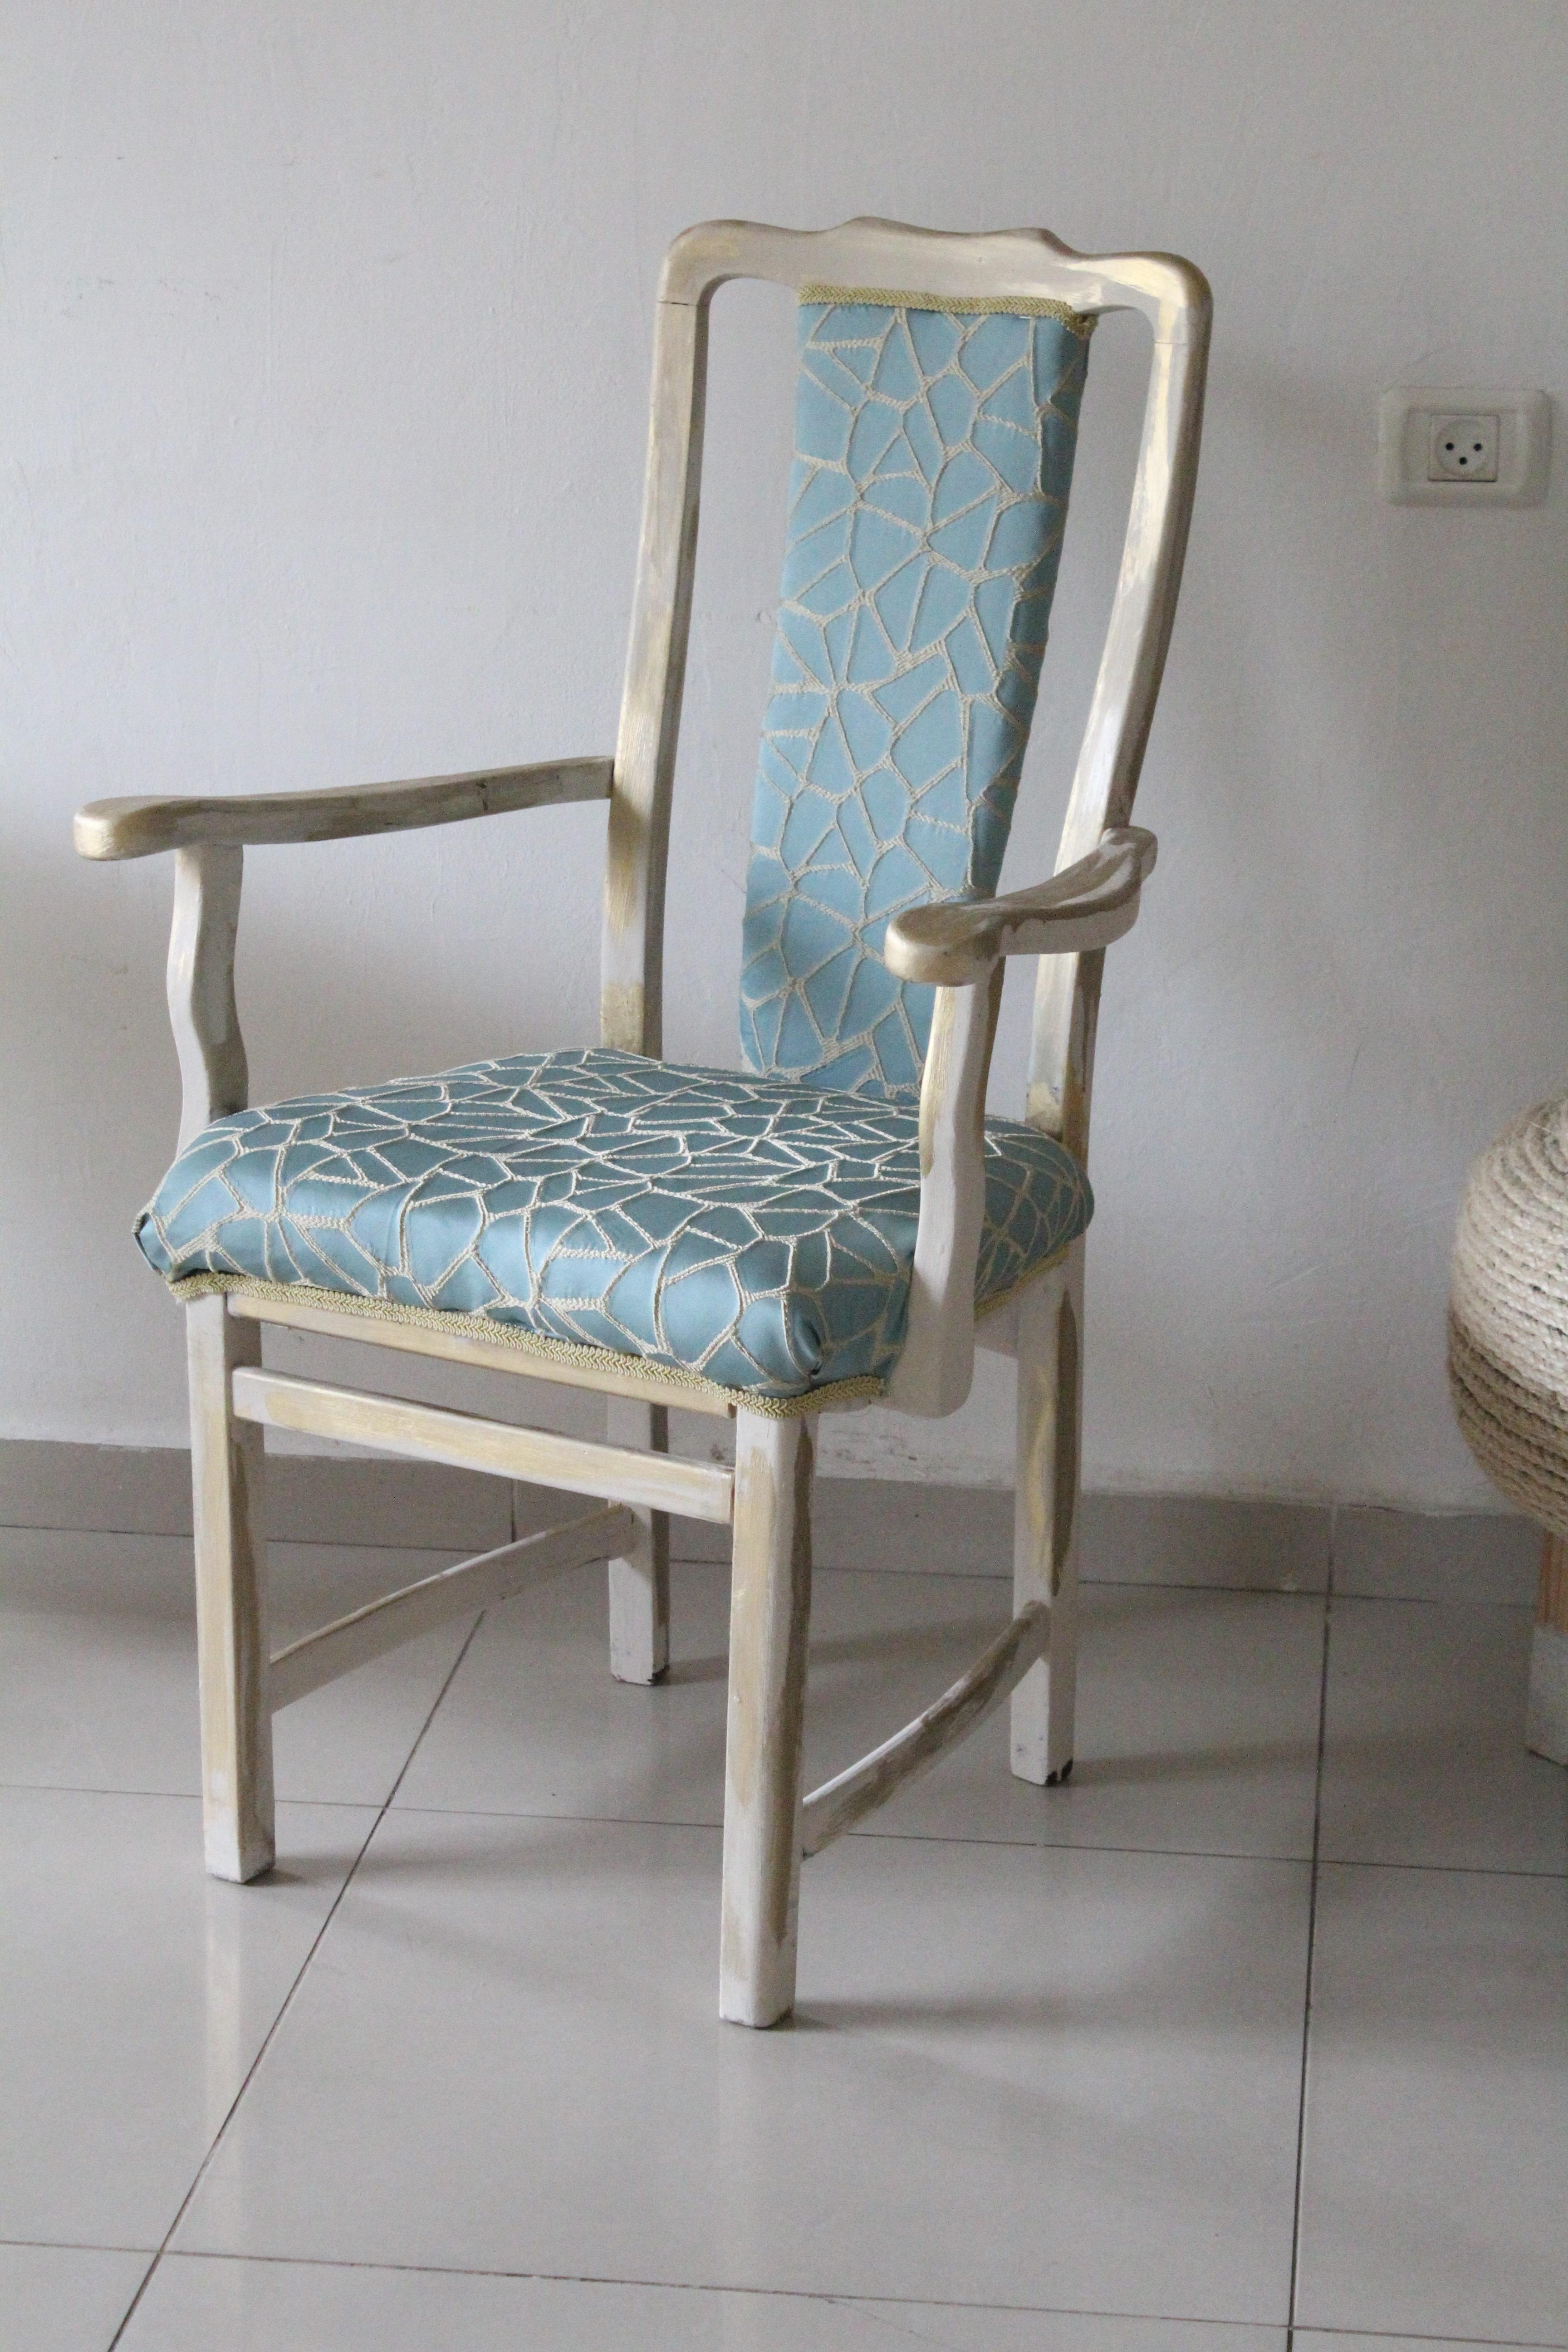 IMG 7665 e1558297685369 - חידוש כסא לסט הסלוני